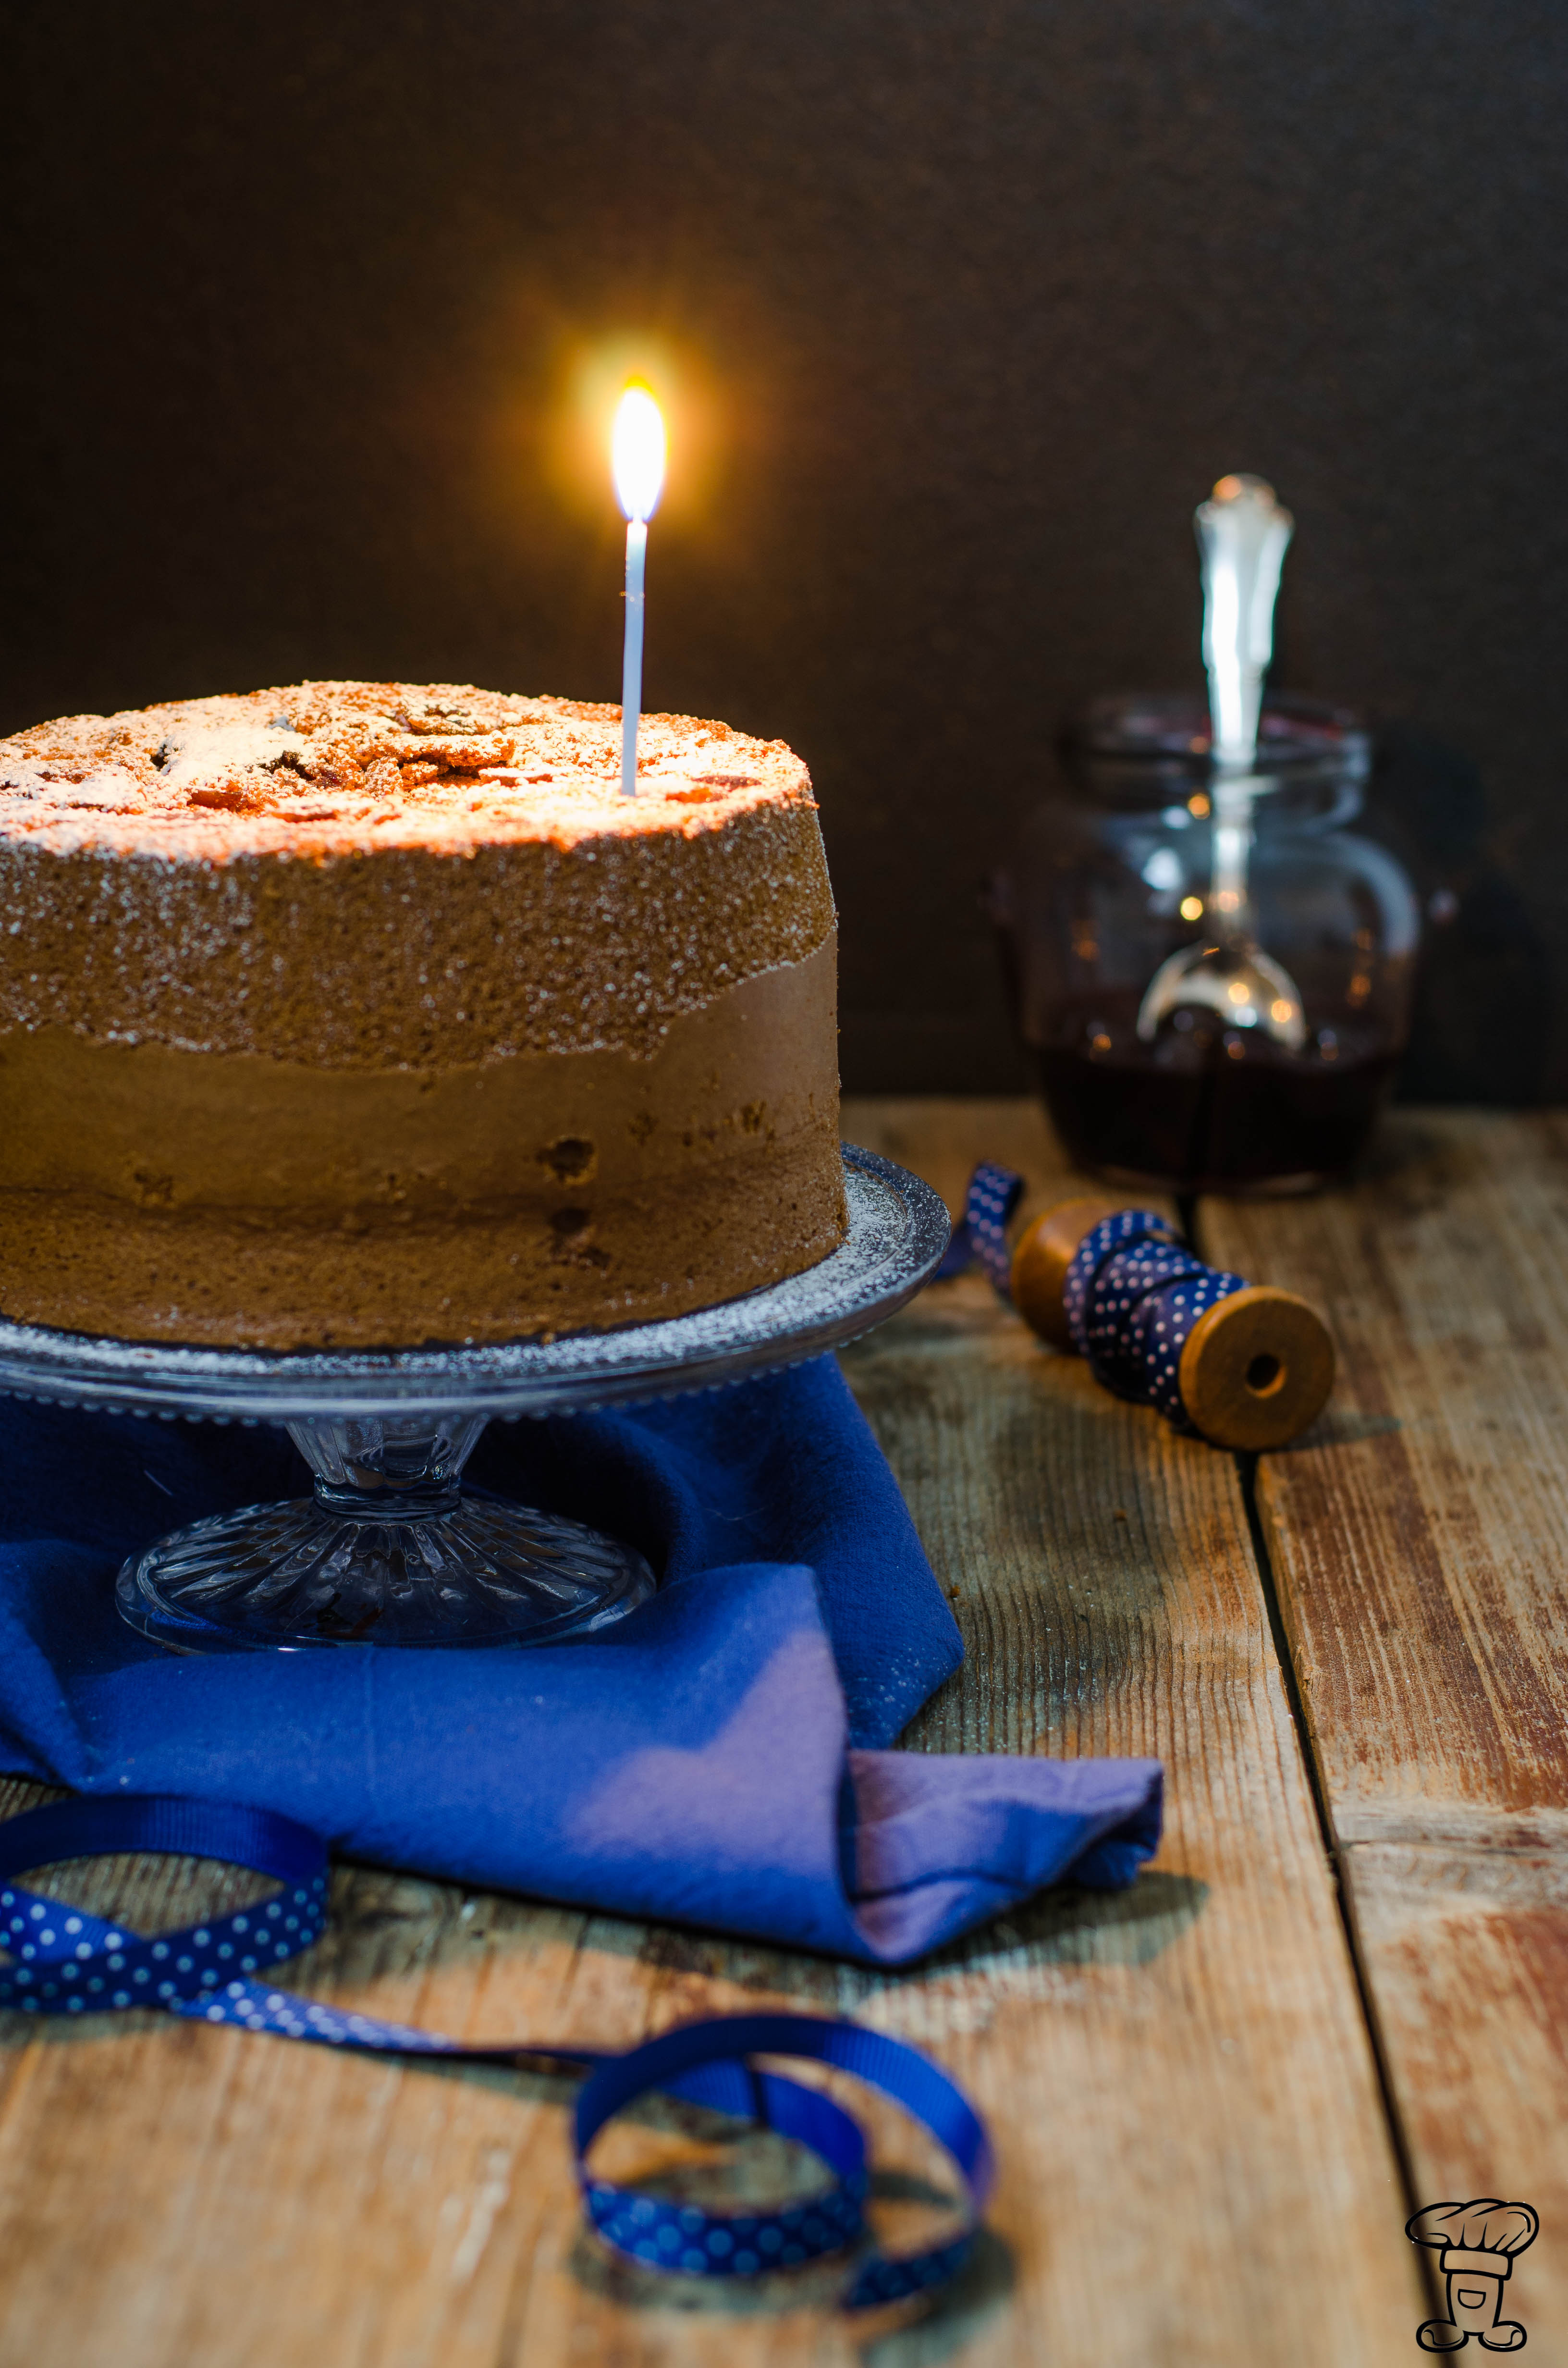 Fluffosa-birra_amarene_cioccolato Fluffosa alla birra, cacao ed amarene (Buon compleanno Ifood!)